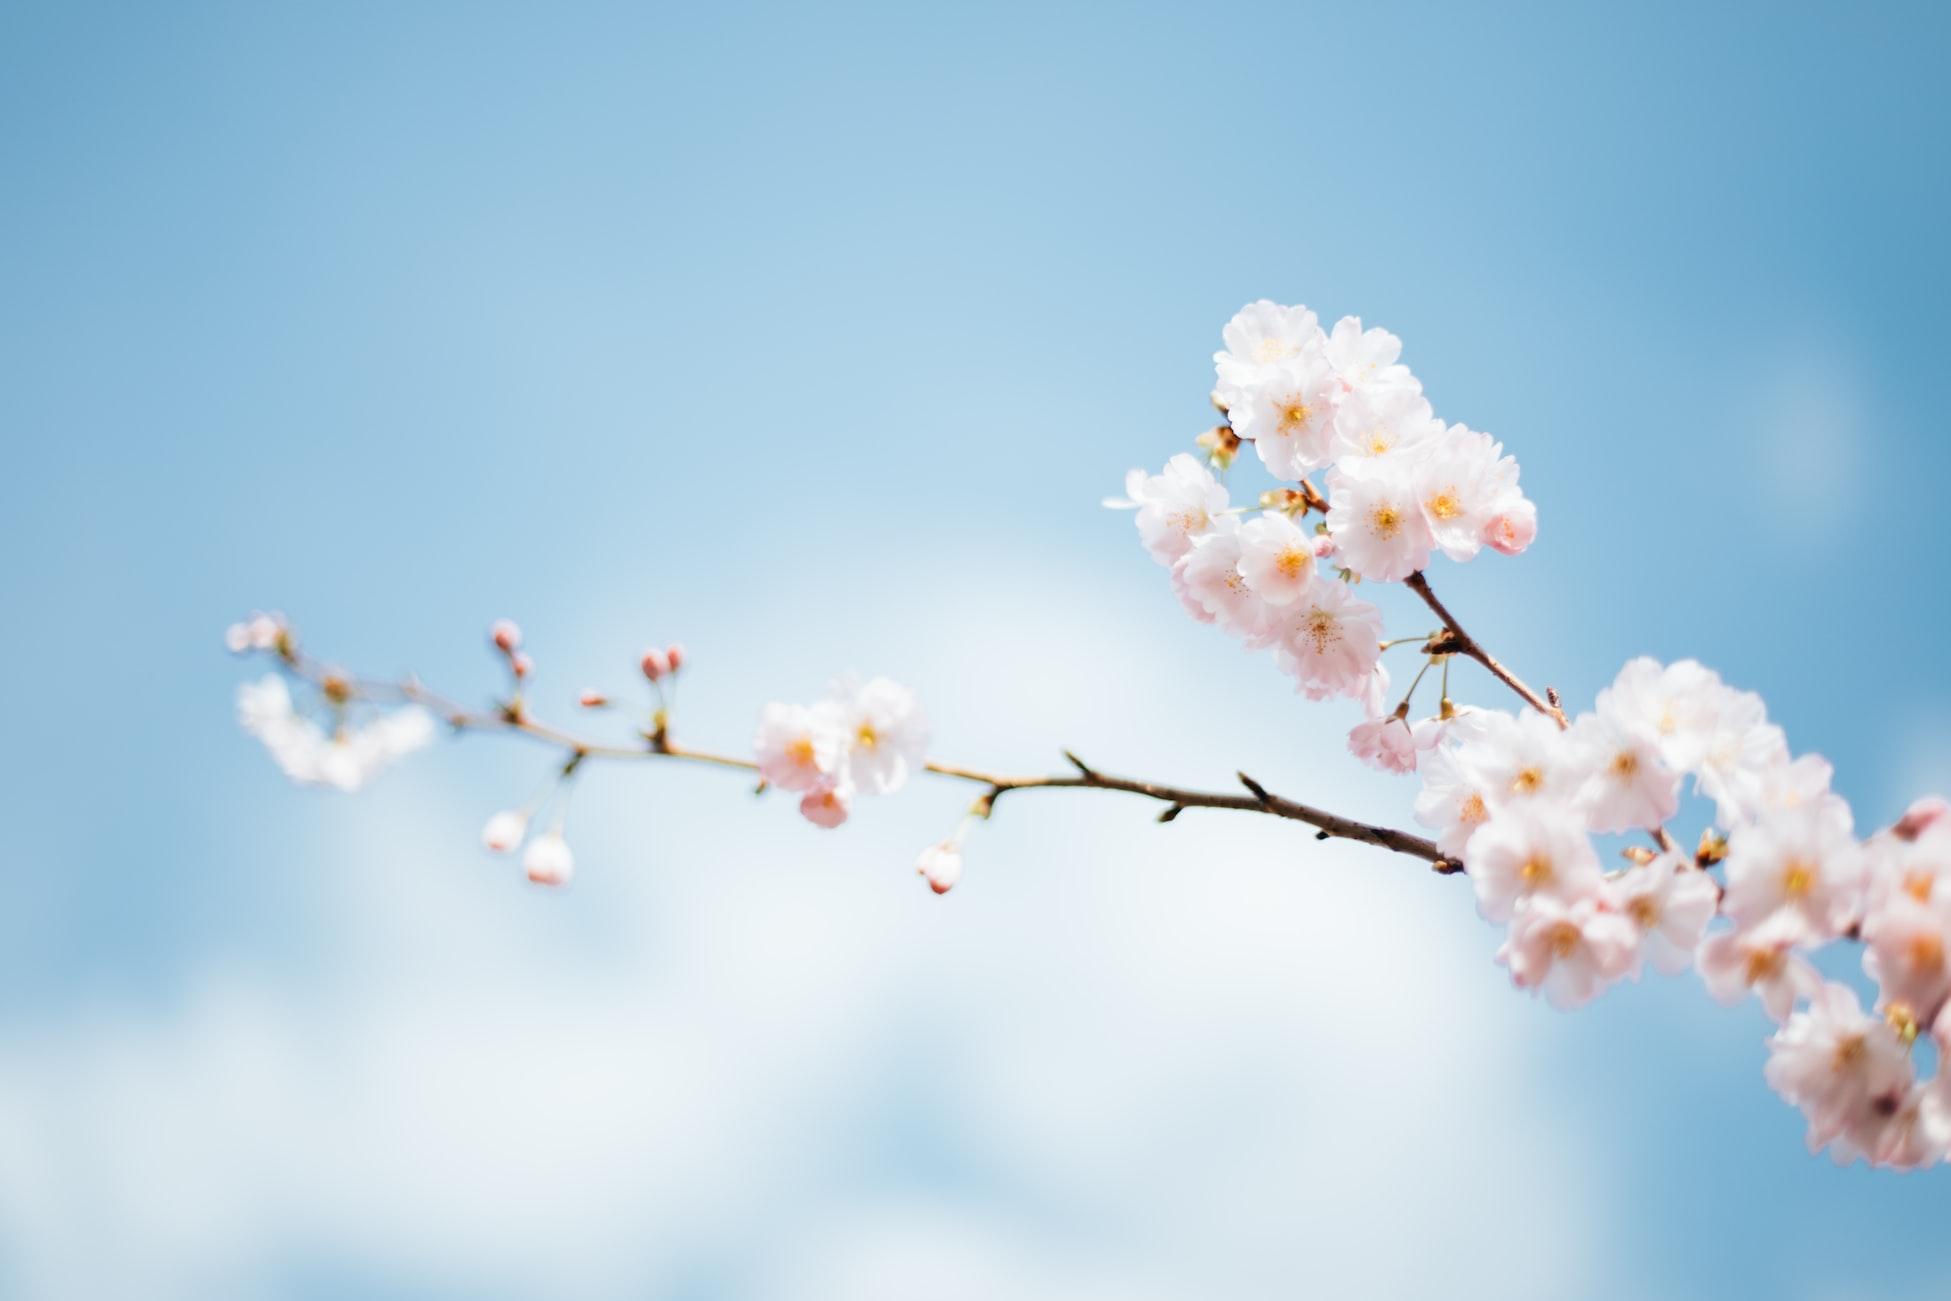 Anthony DELANOIX - Paris, France Spring flower blossoms on branch